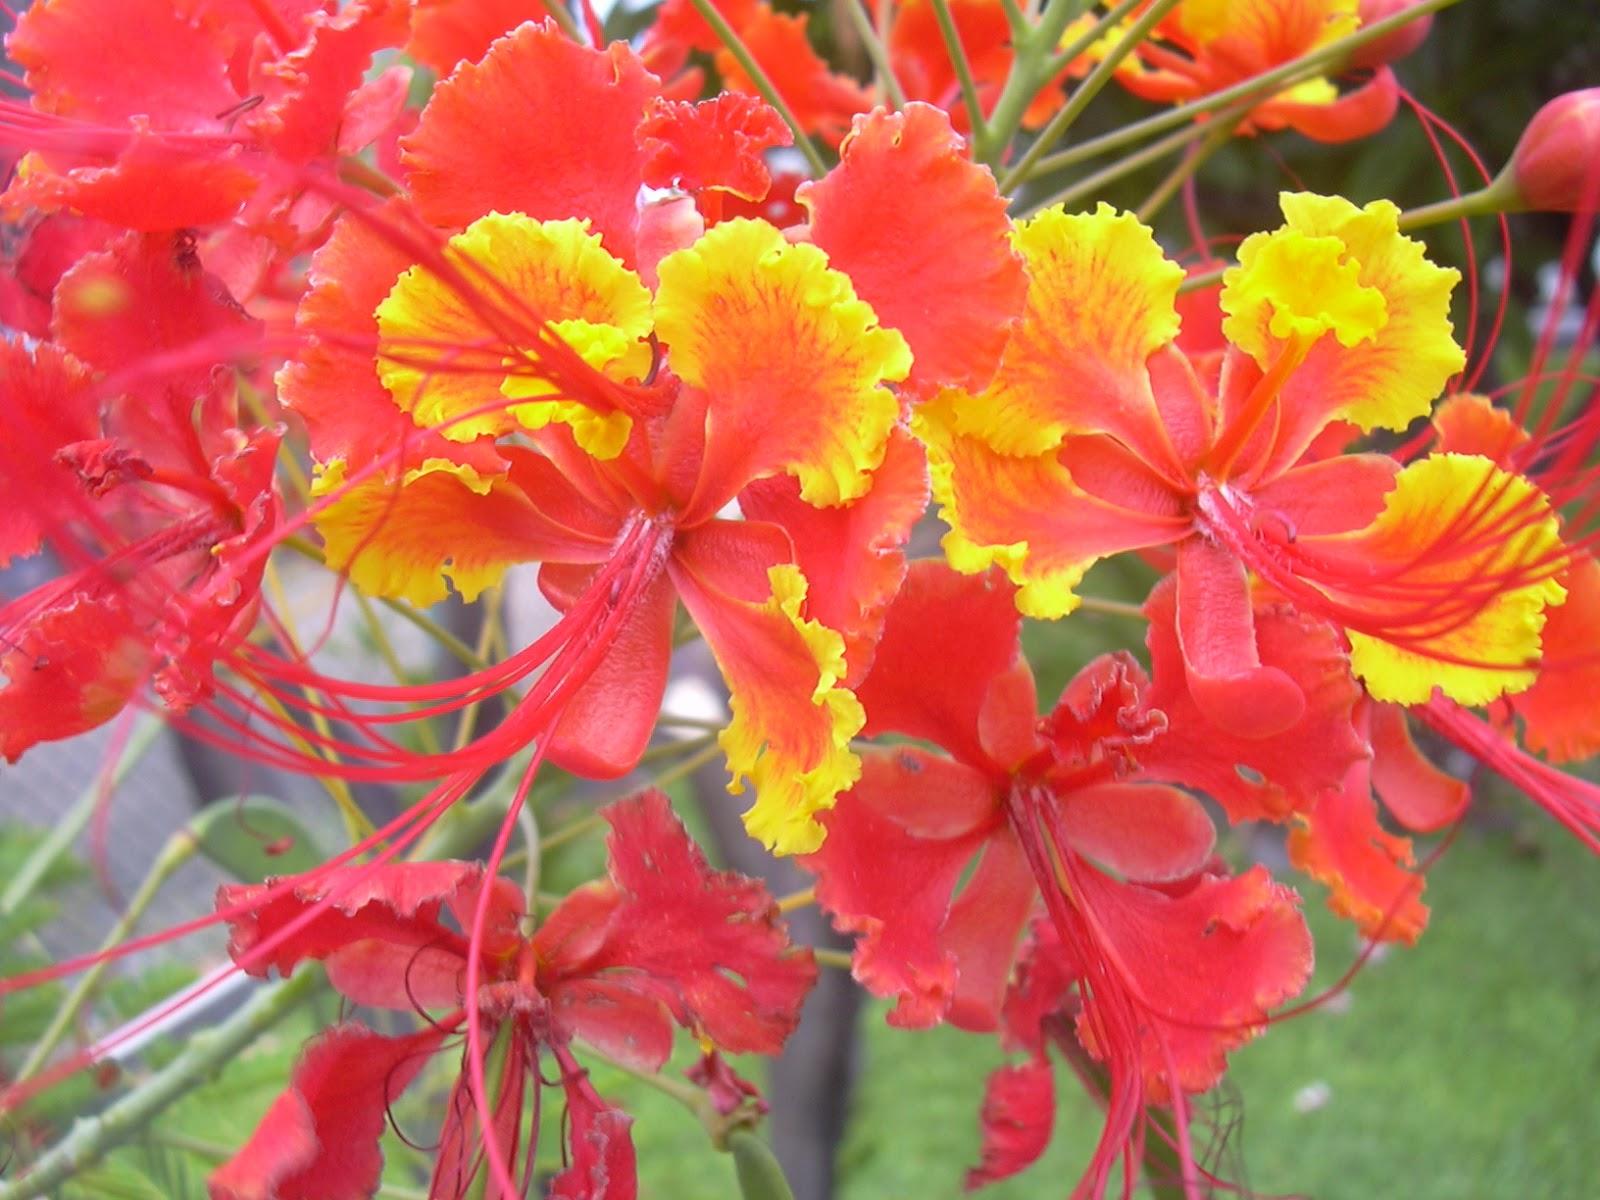 Morfologi tumbuhan praktikum vi bunga majemuk bunga merak caesalpinia pulcherrima swart ccuart Gallery